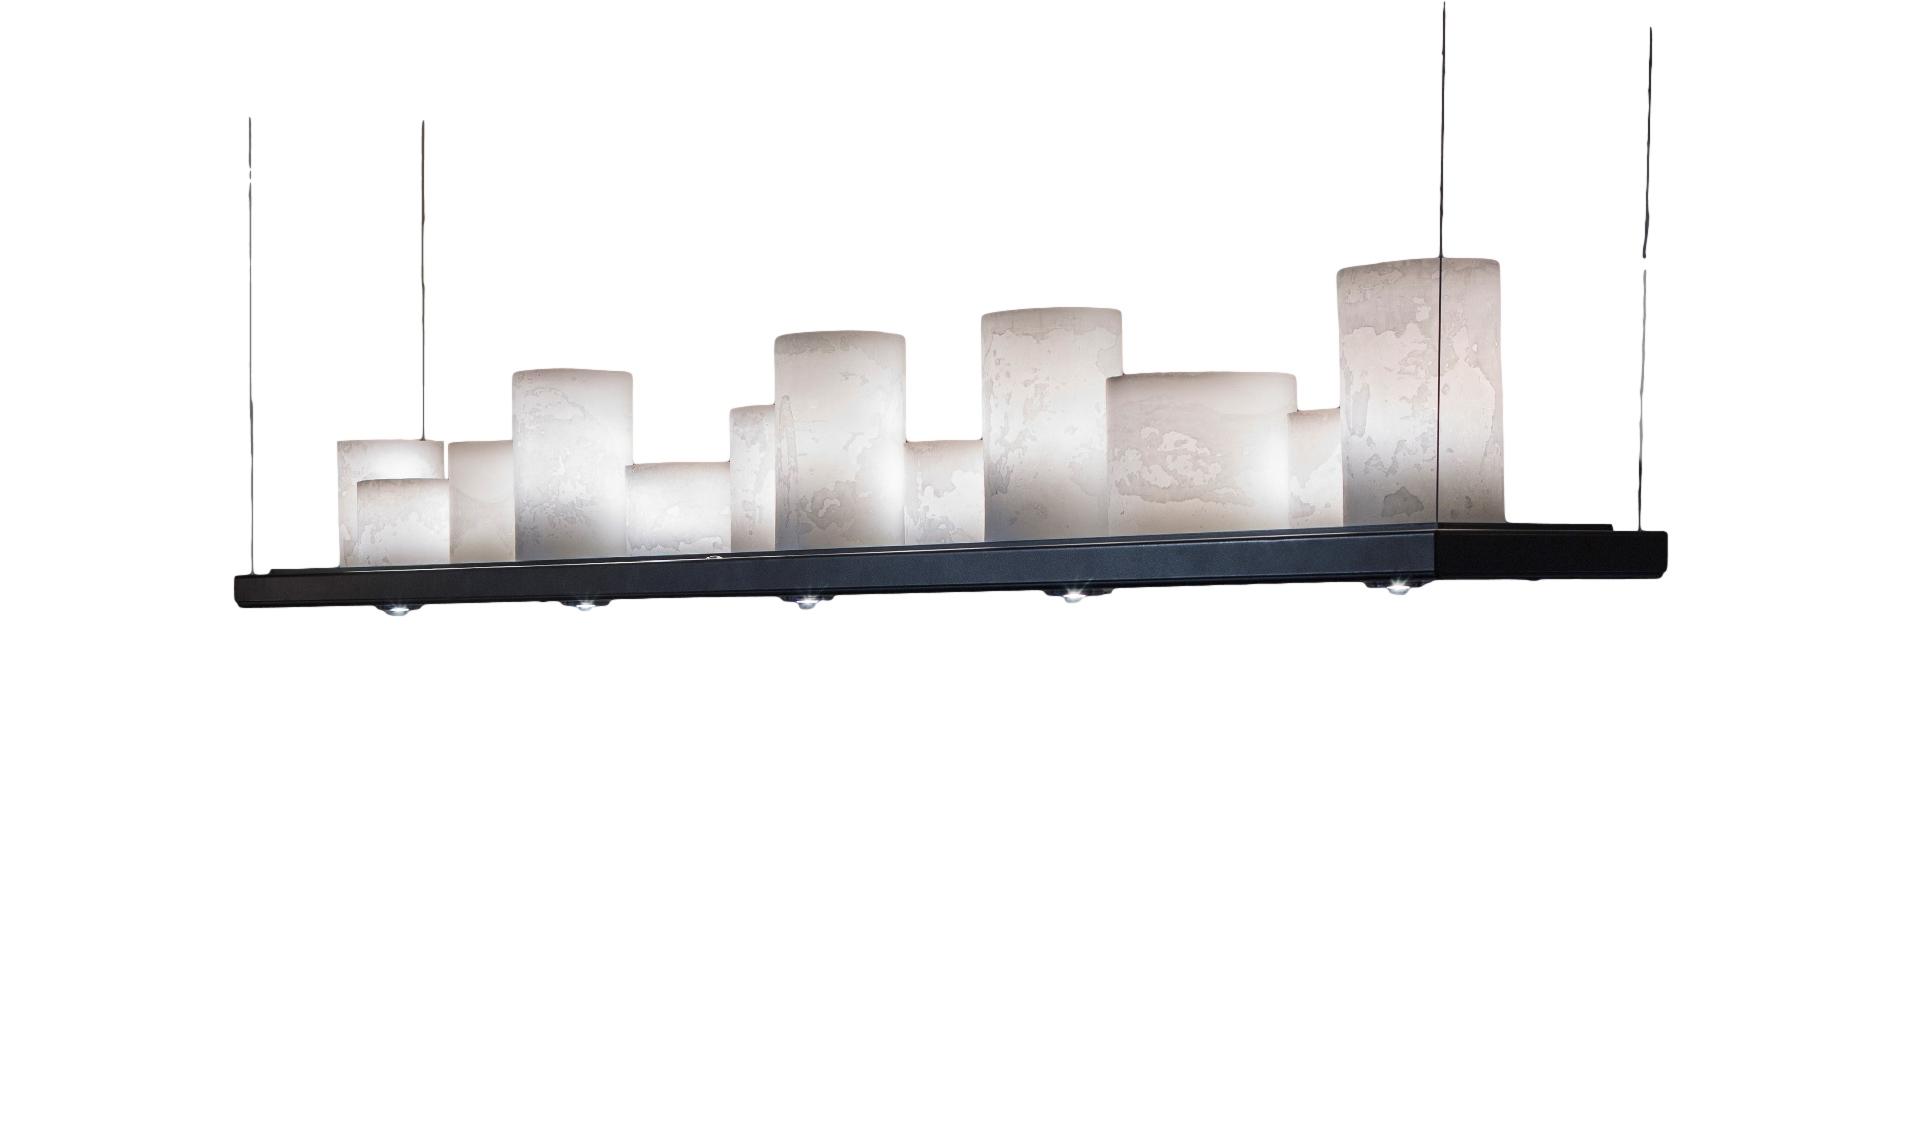 Stout Verlichting Collectie Sfeerfoto 125x25 cm 3x led spot + E14 kaars 8